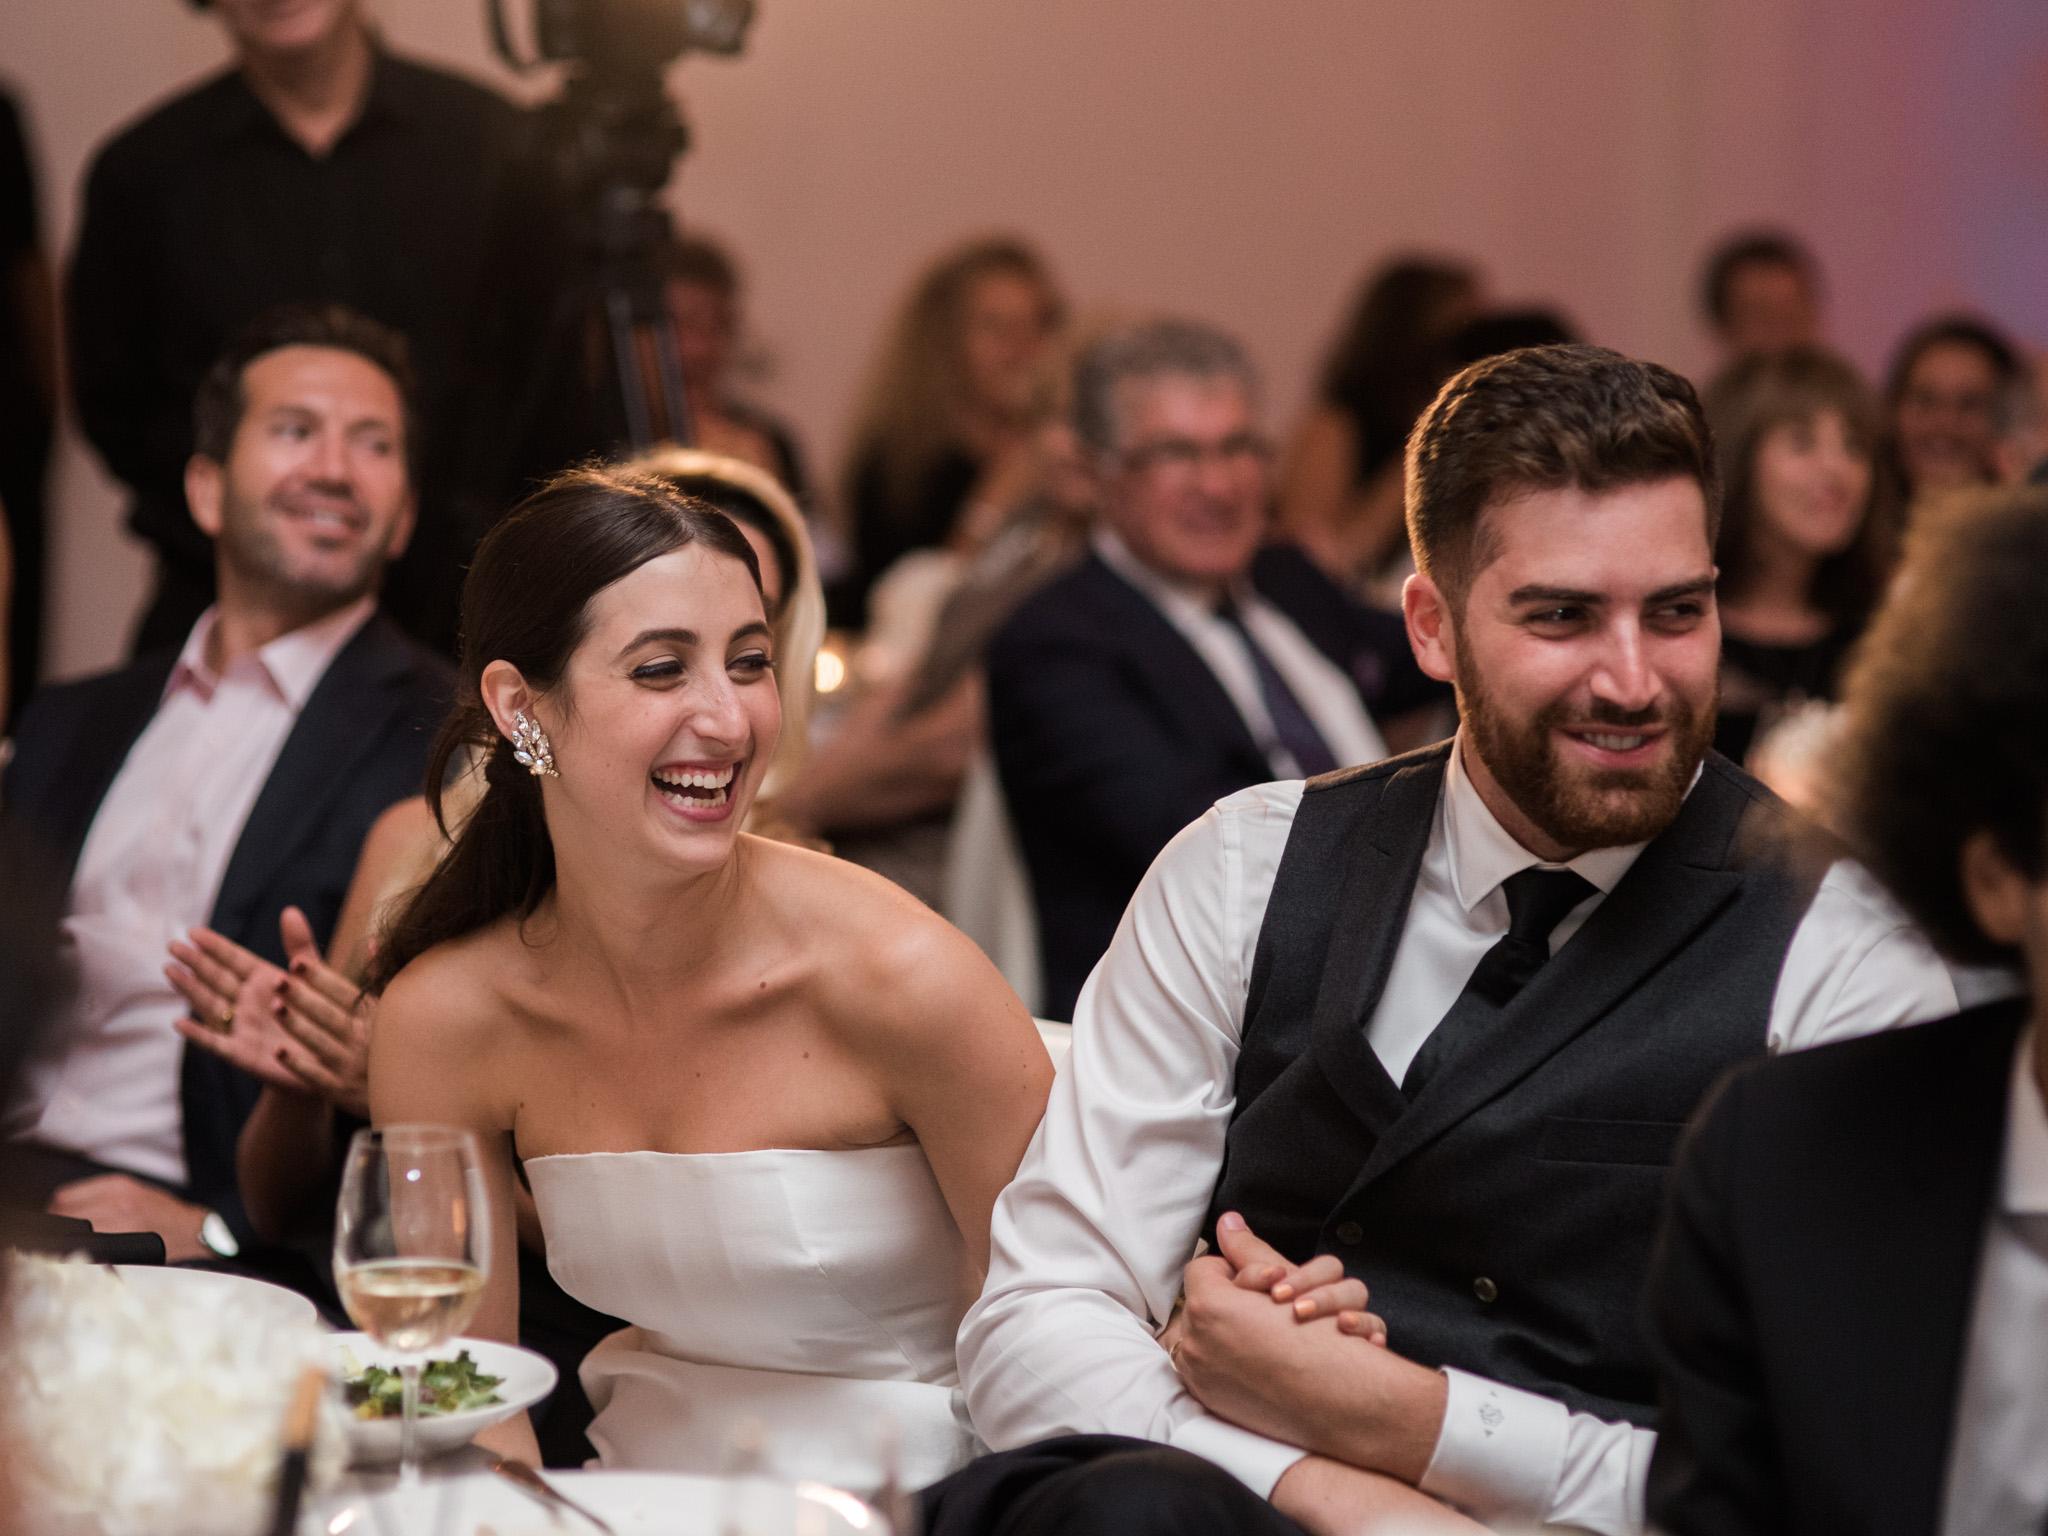 Gladstone-Toronto-Wedding-99-sudbury-64.jpg